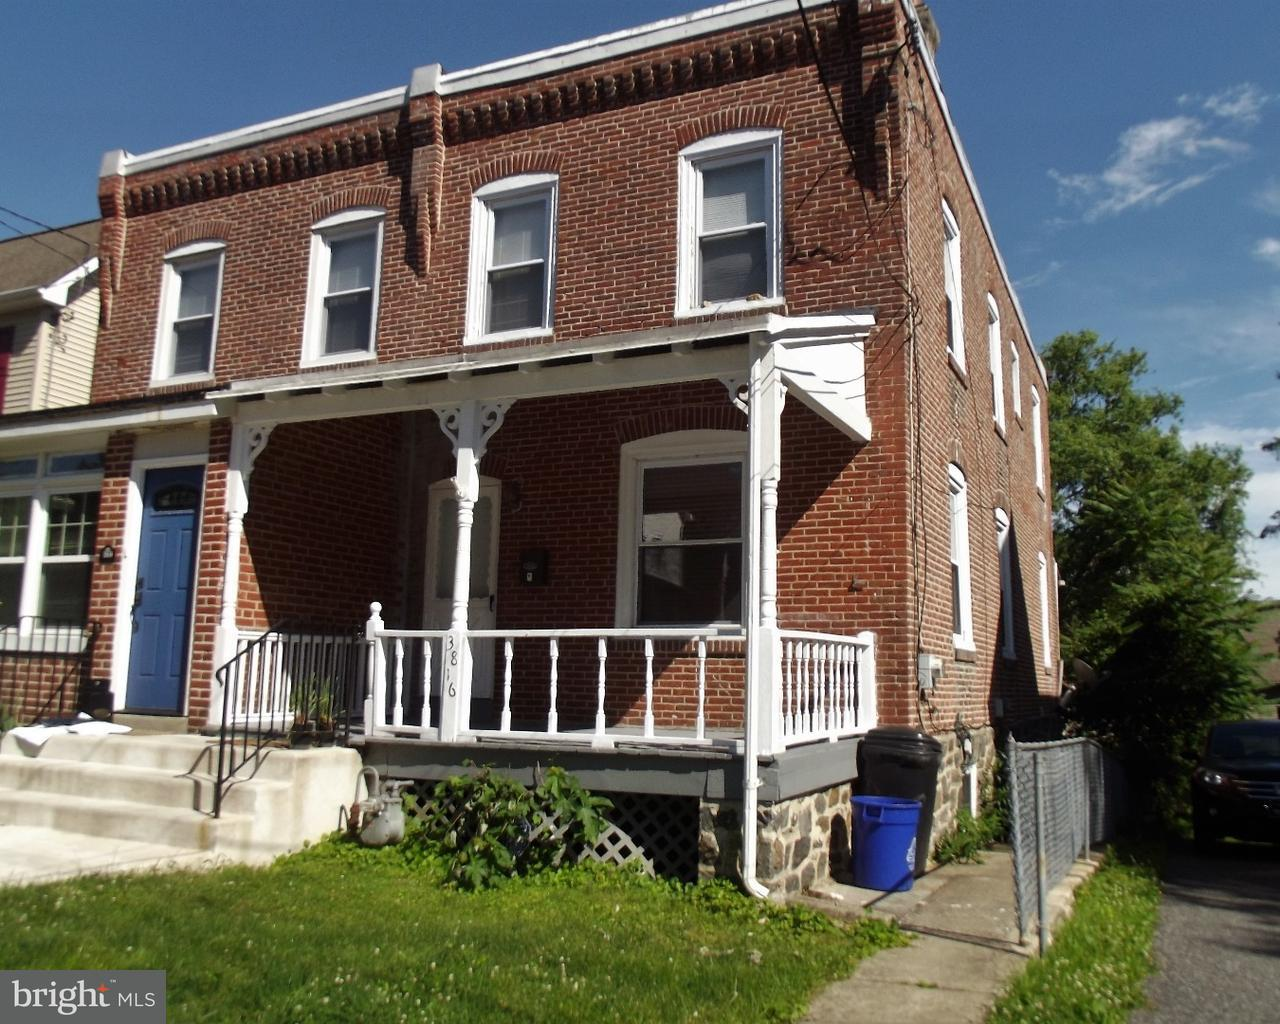 3816 James Street Drexel Hill, PA 19026